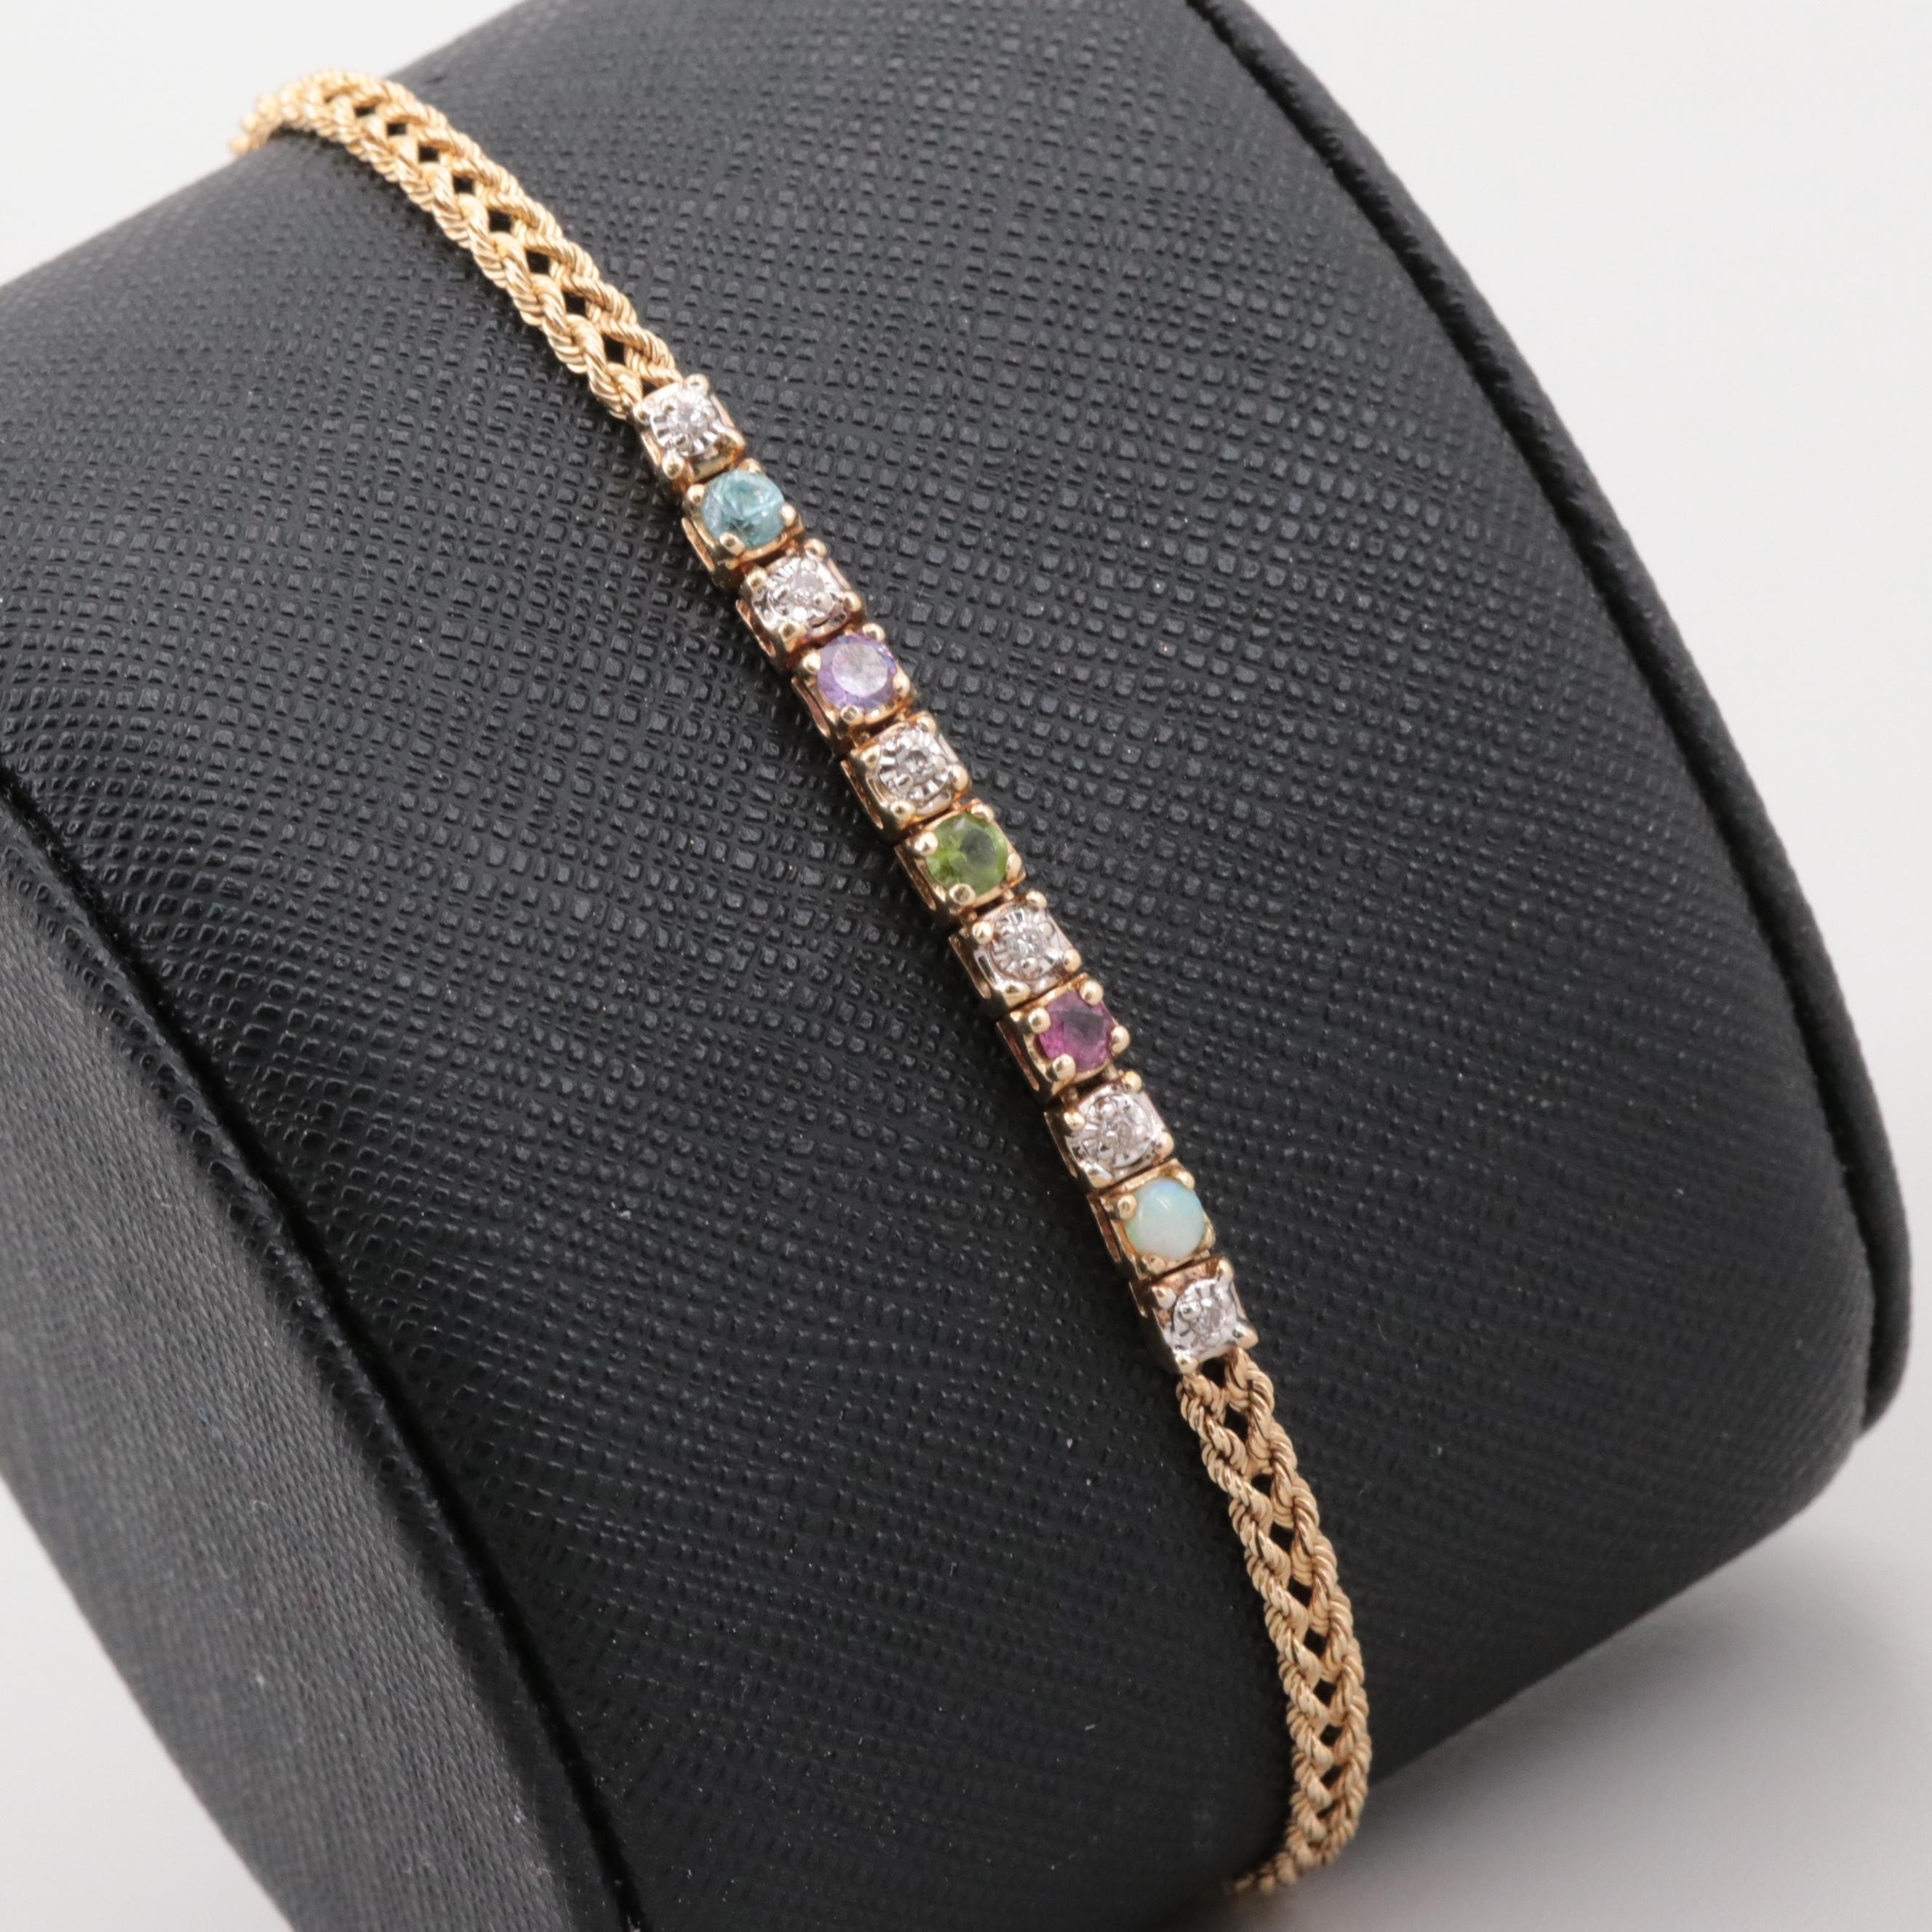 10K Yellow Gold Diamond and Multi-Gemstone Line Bracelet